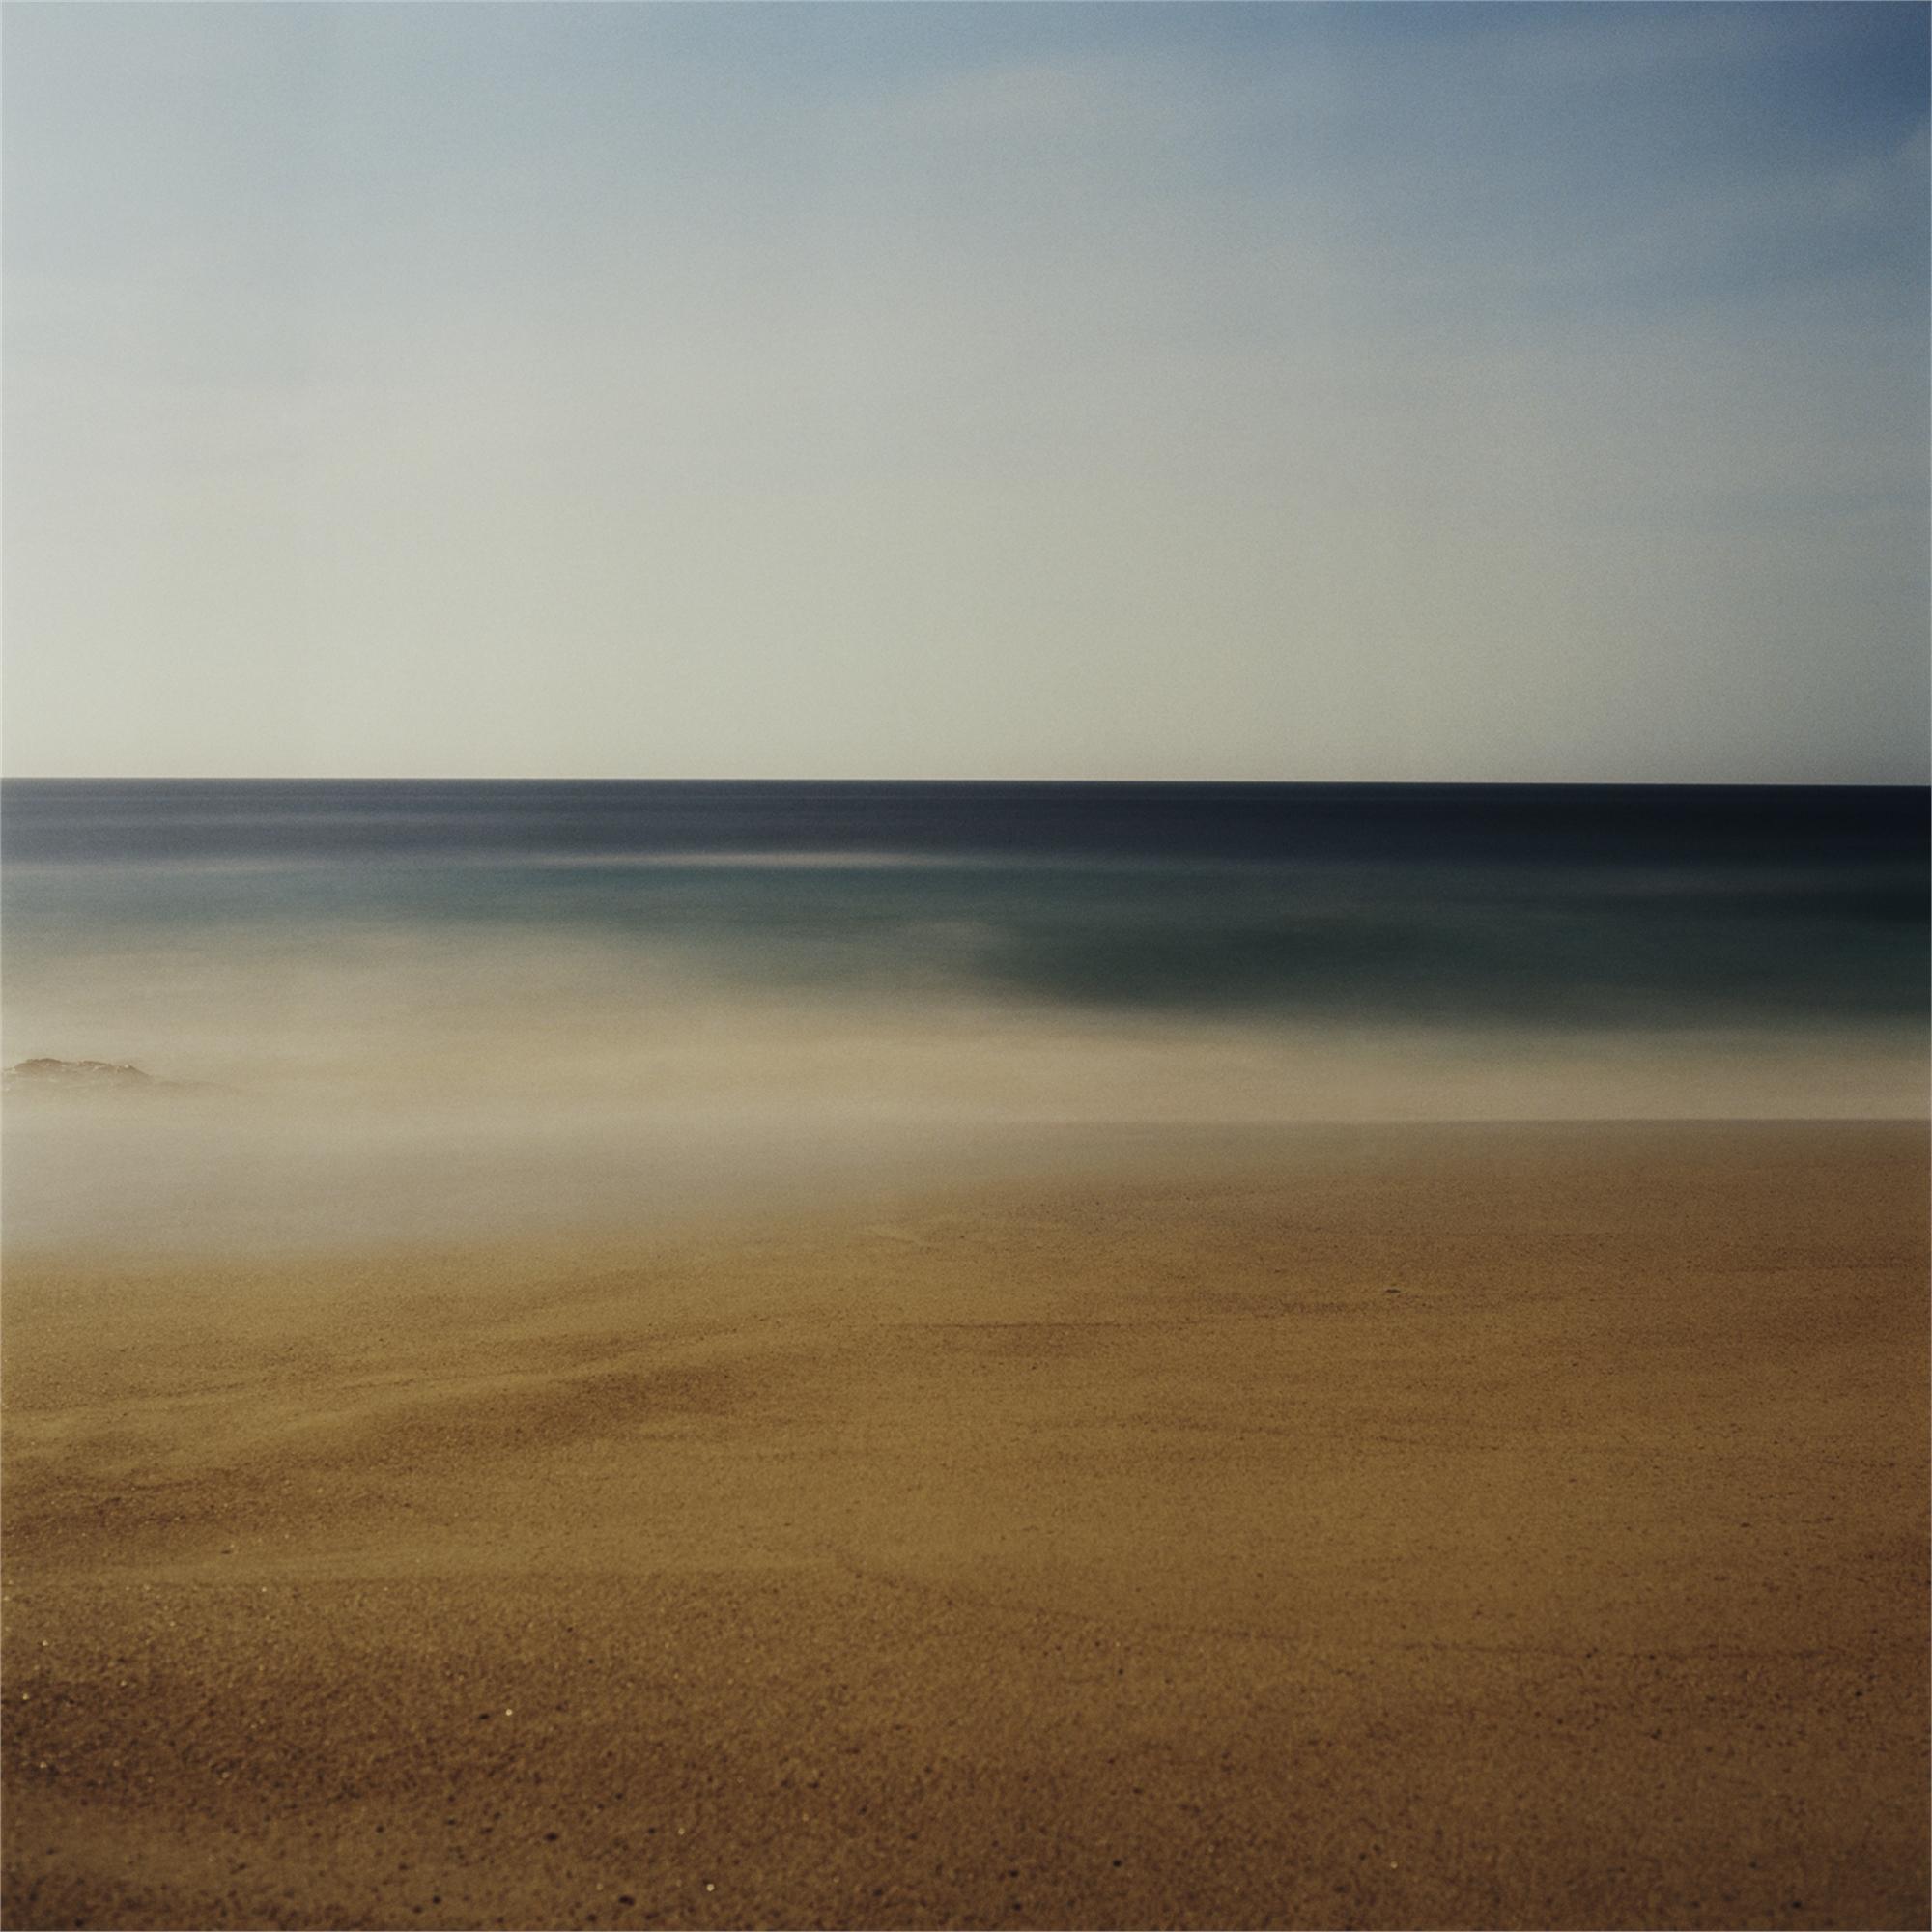 1:12 a.m. Playa Las Viudas by Daniel Fuller